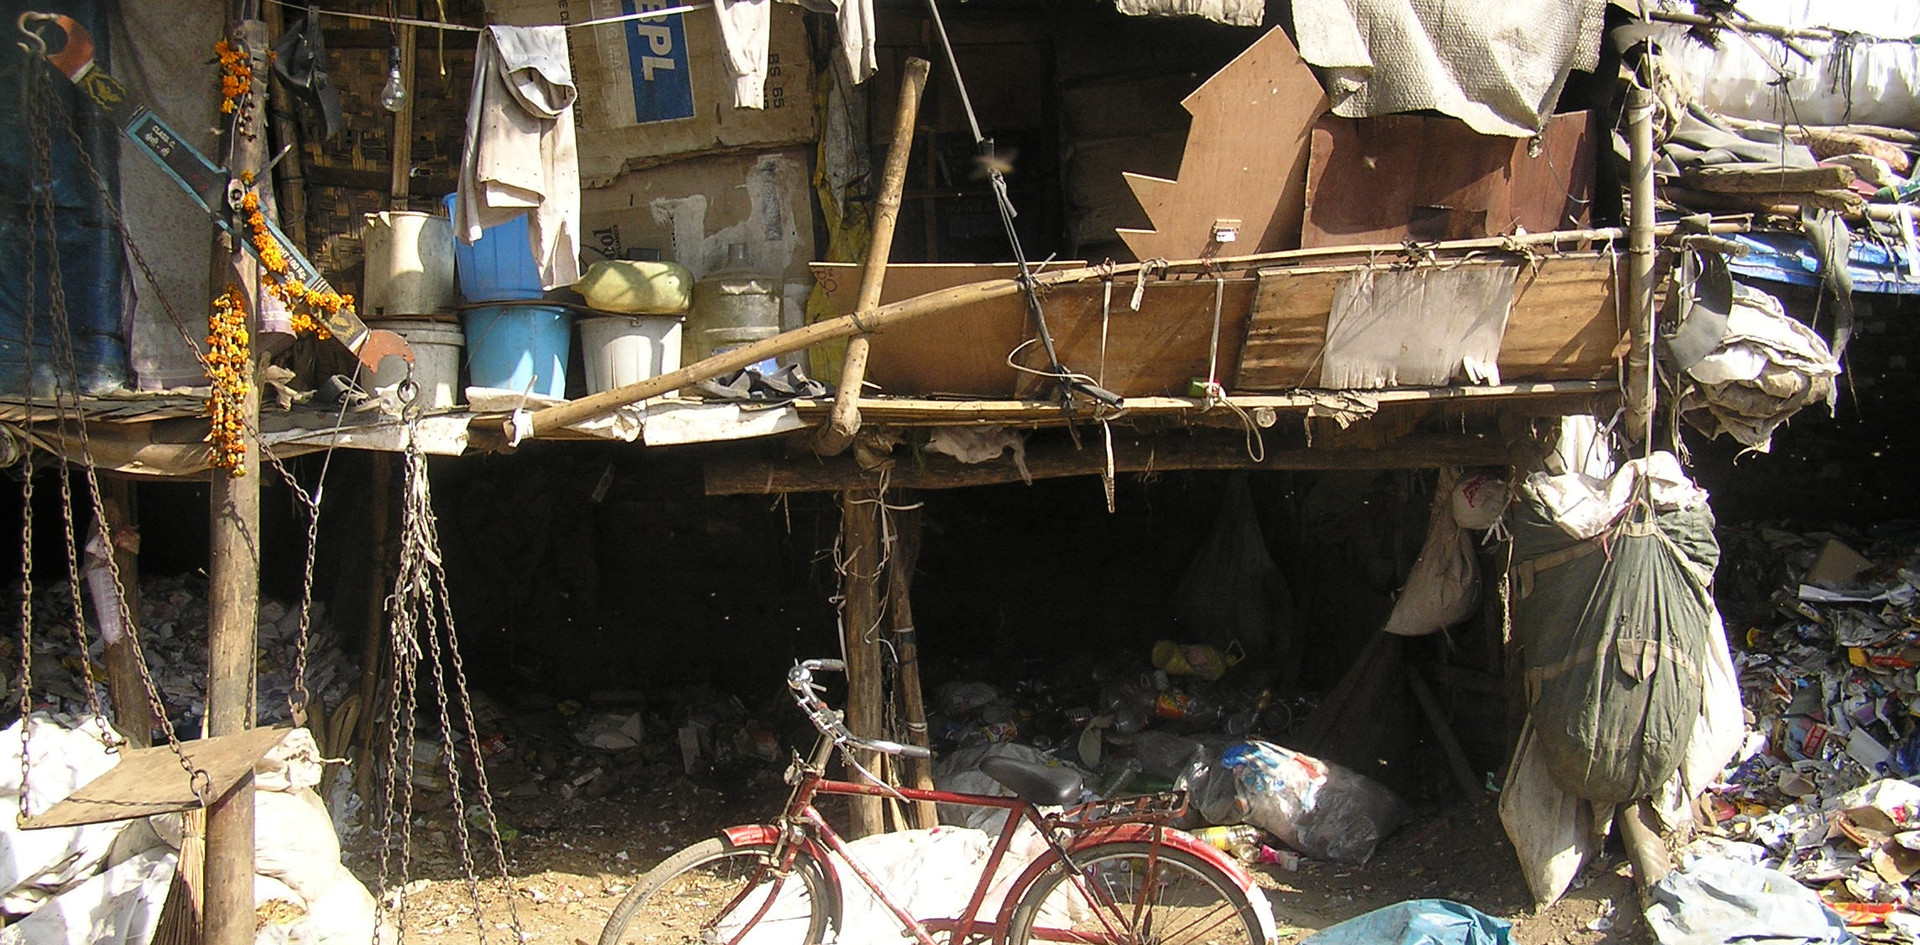 Bamboo Wastepicker House